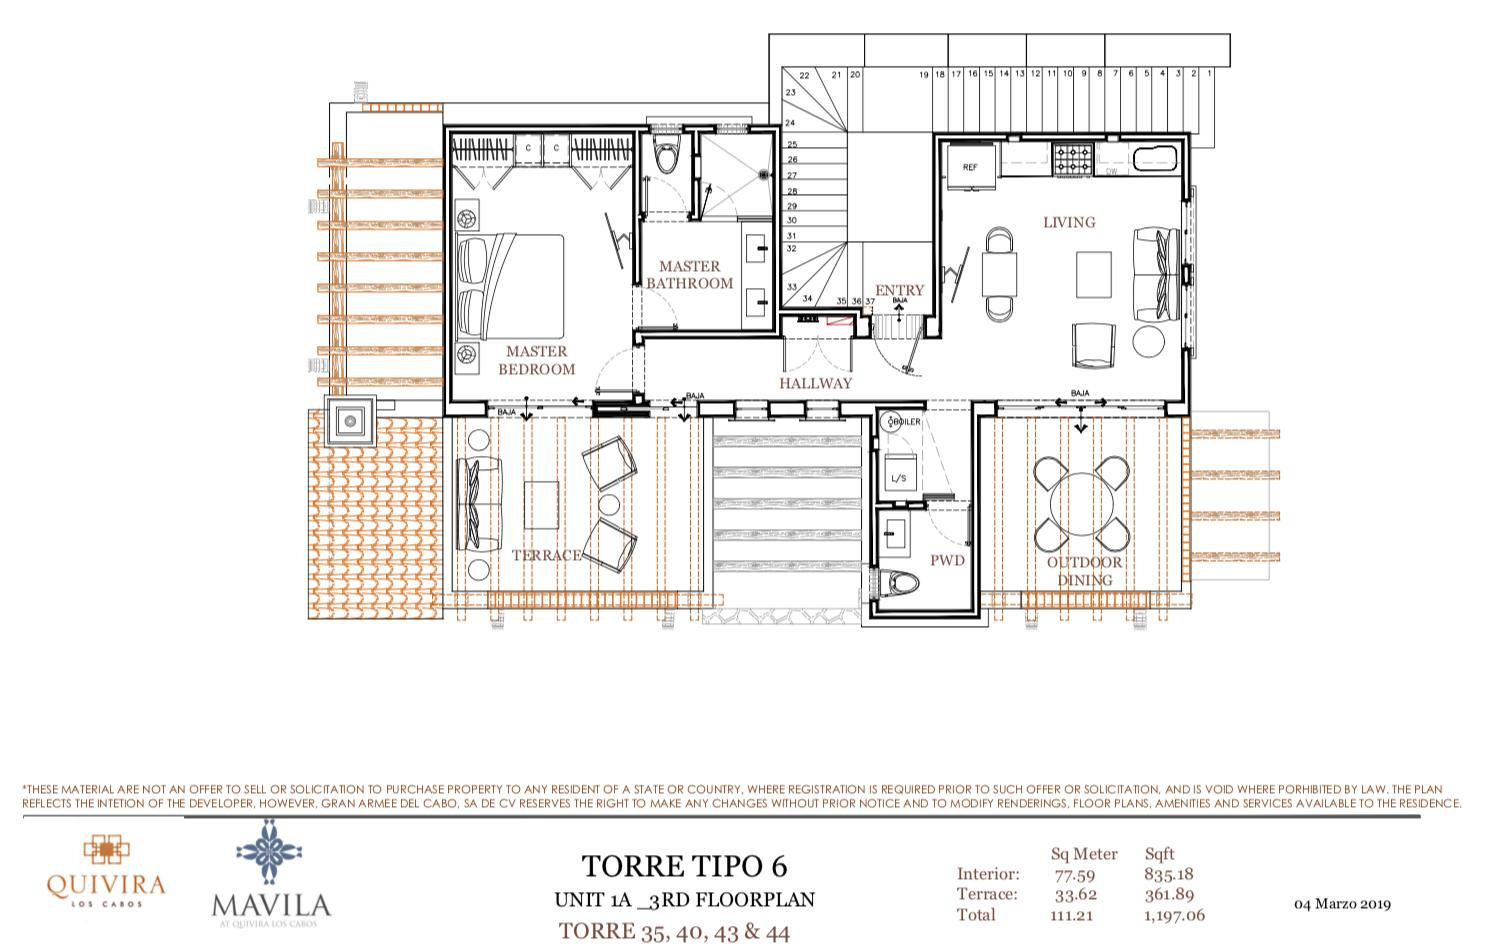 Pacific, 1 Bedroom Bedrooms, ,1 BathroomBathrooms,Condo,For Sale,Walk-up Condos 1 Bed Penthouse,19-955